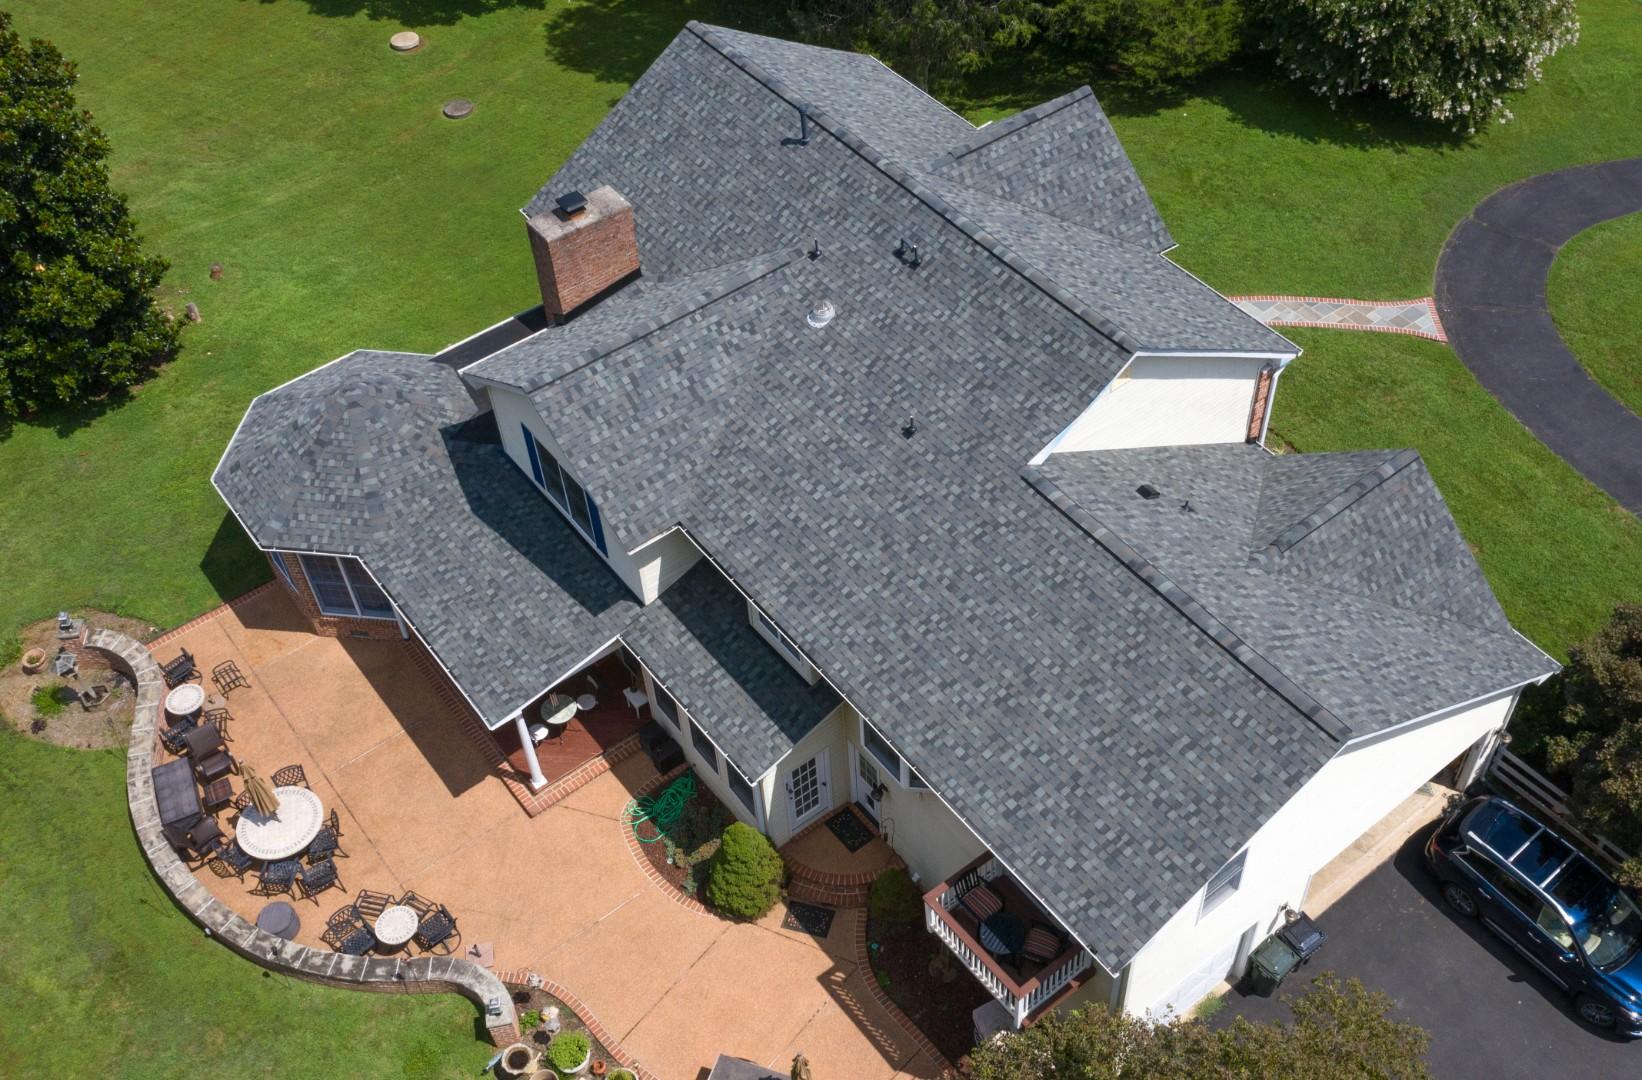 SmartRoof - Residential, Commercial Moorestown NJ Roofing Contractors